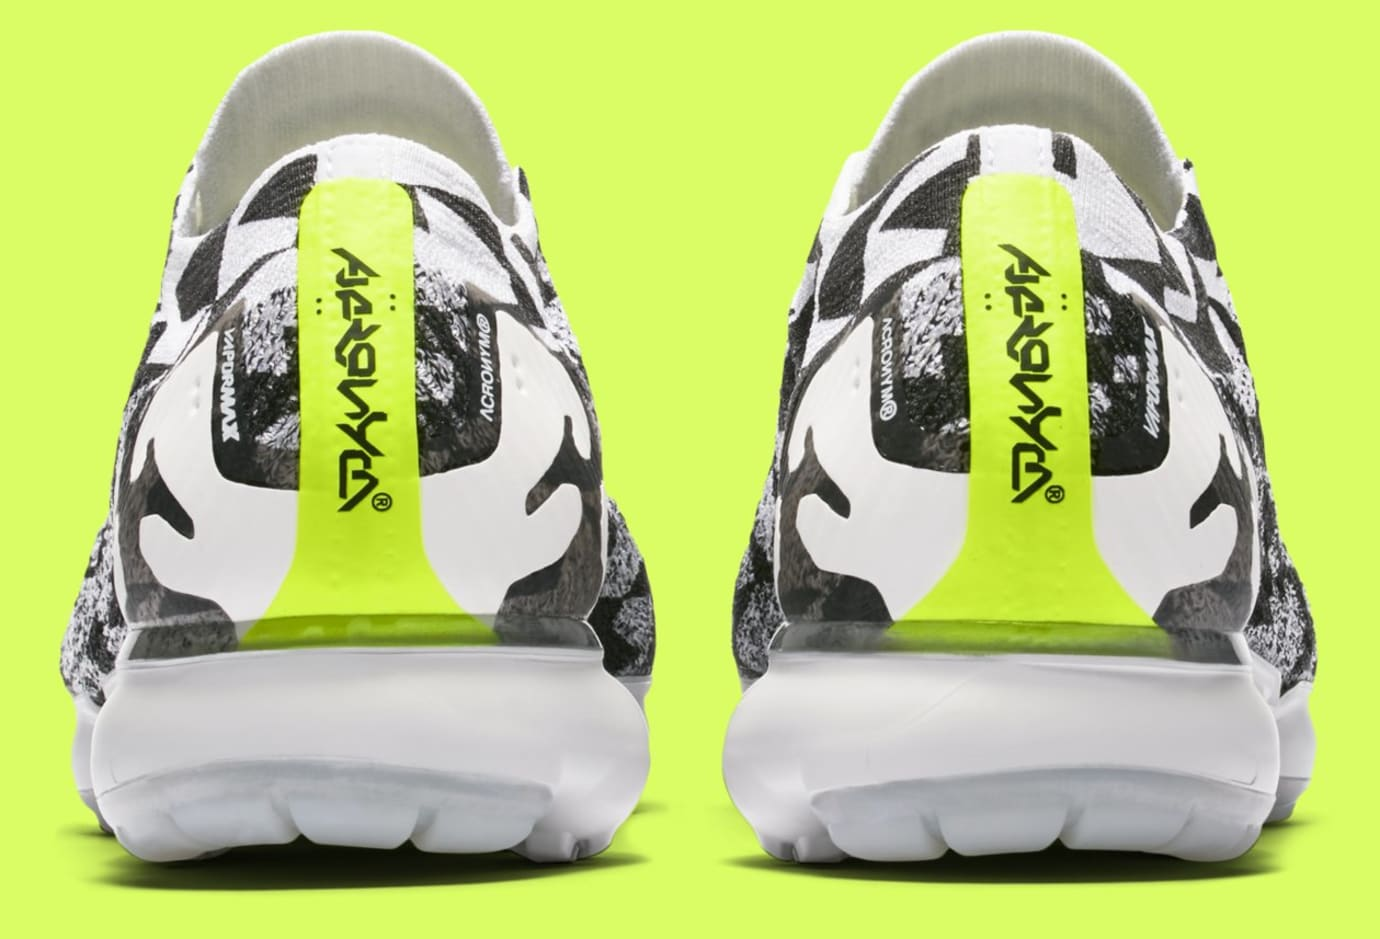 Acronym x Nike Air VaporMax Moc 2 AQ0996-001 (Heel)